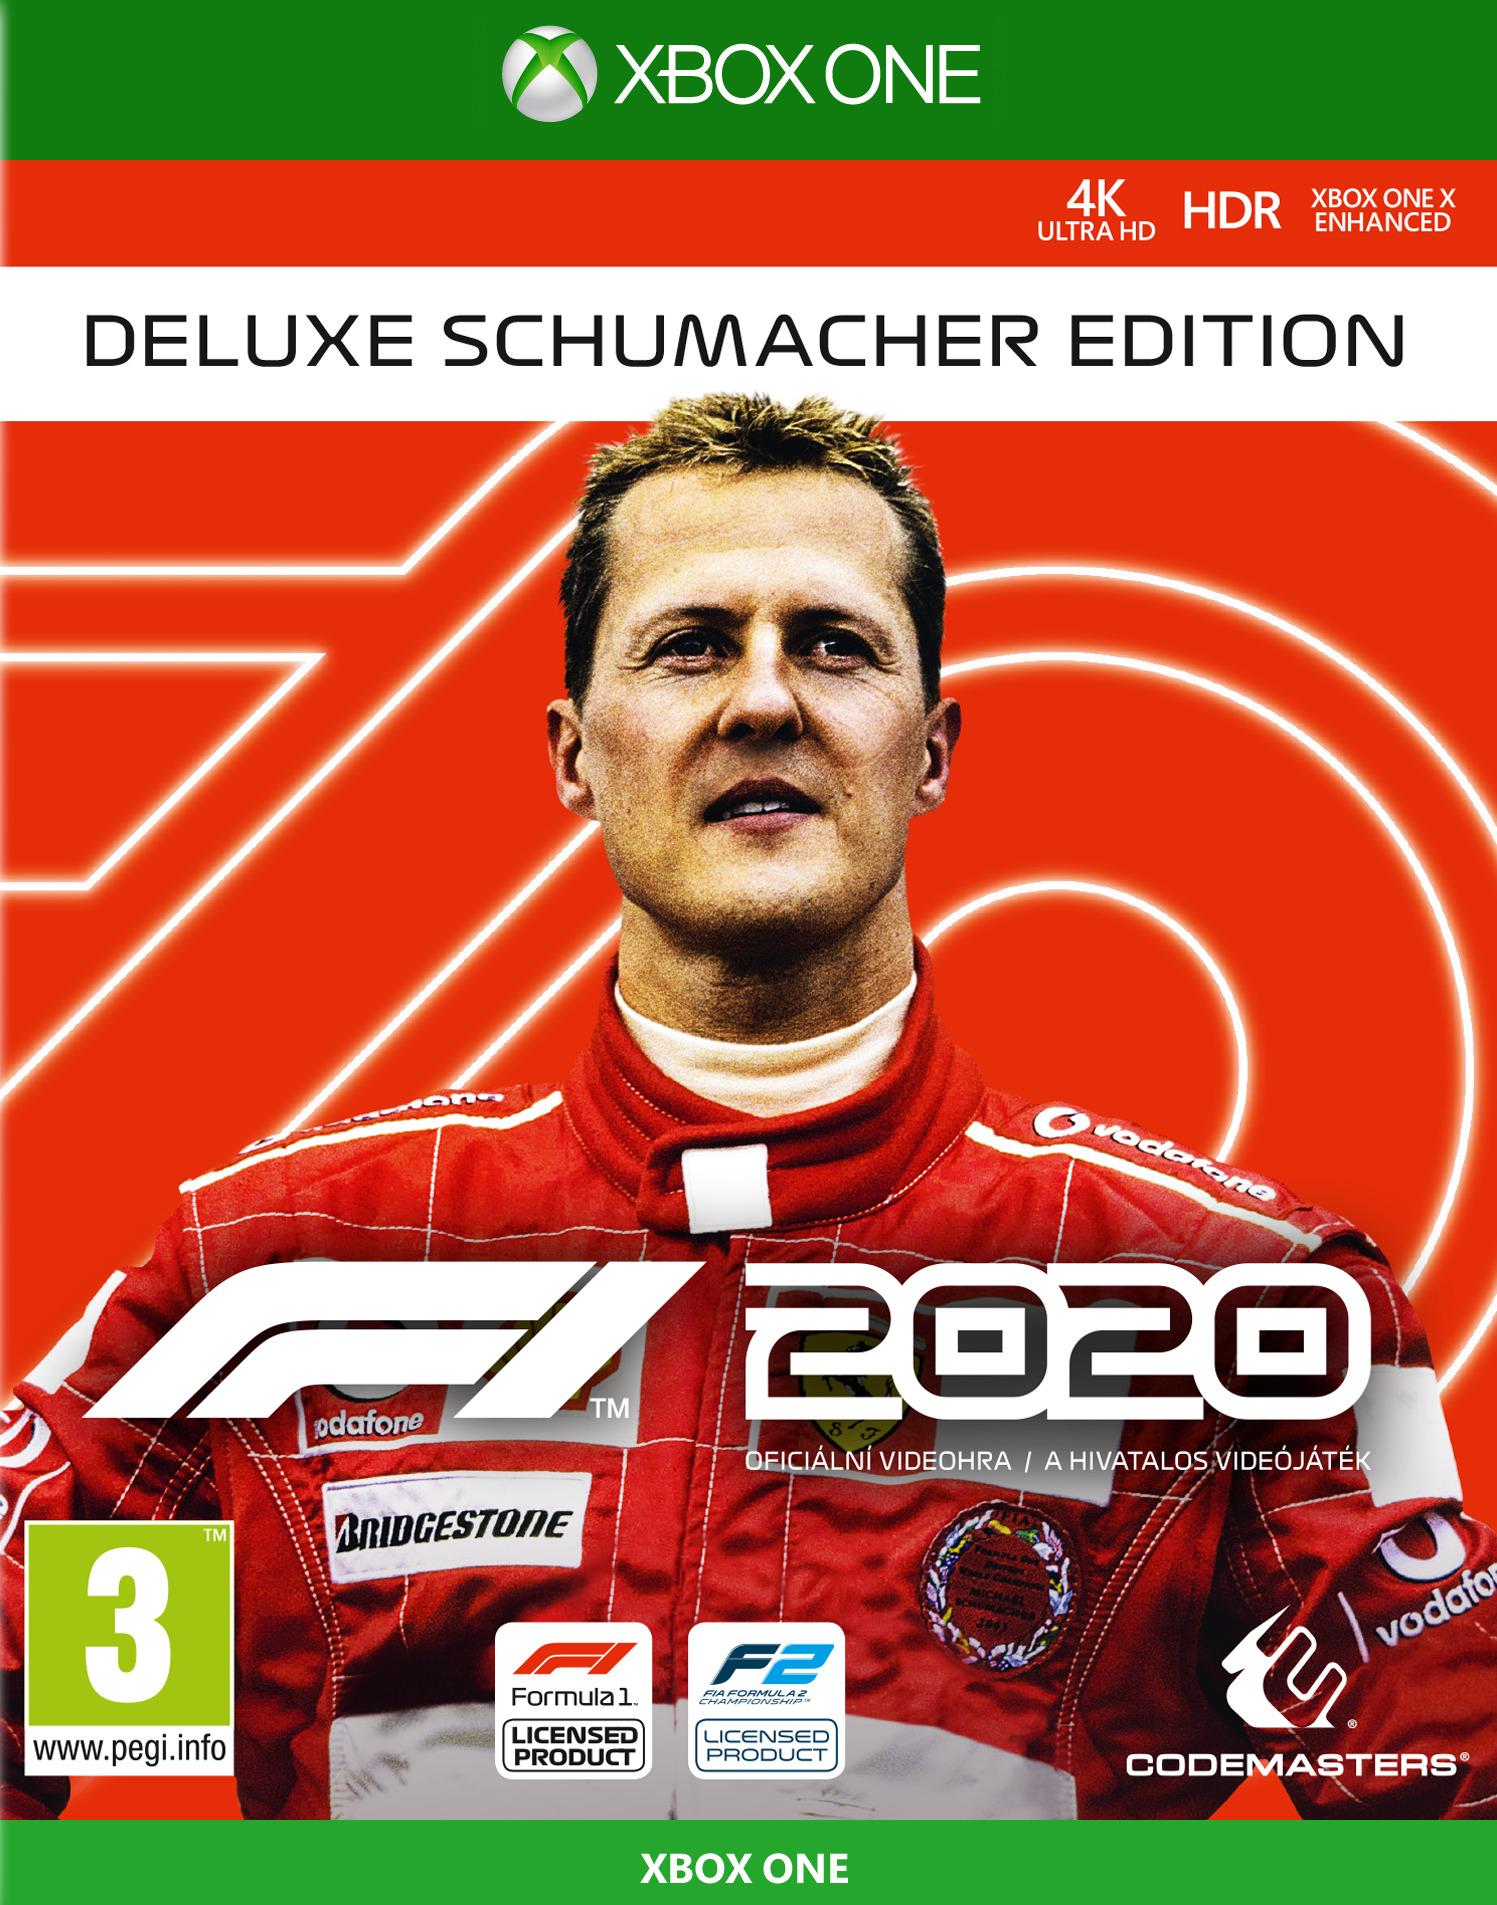 F1 2020 - Deluxe Schumacher Edition (XBOX)